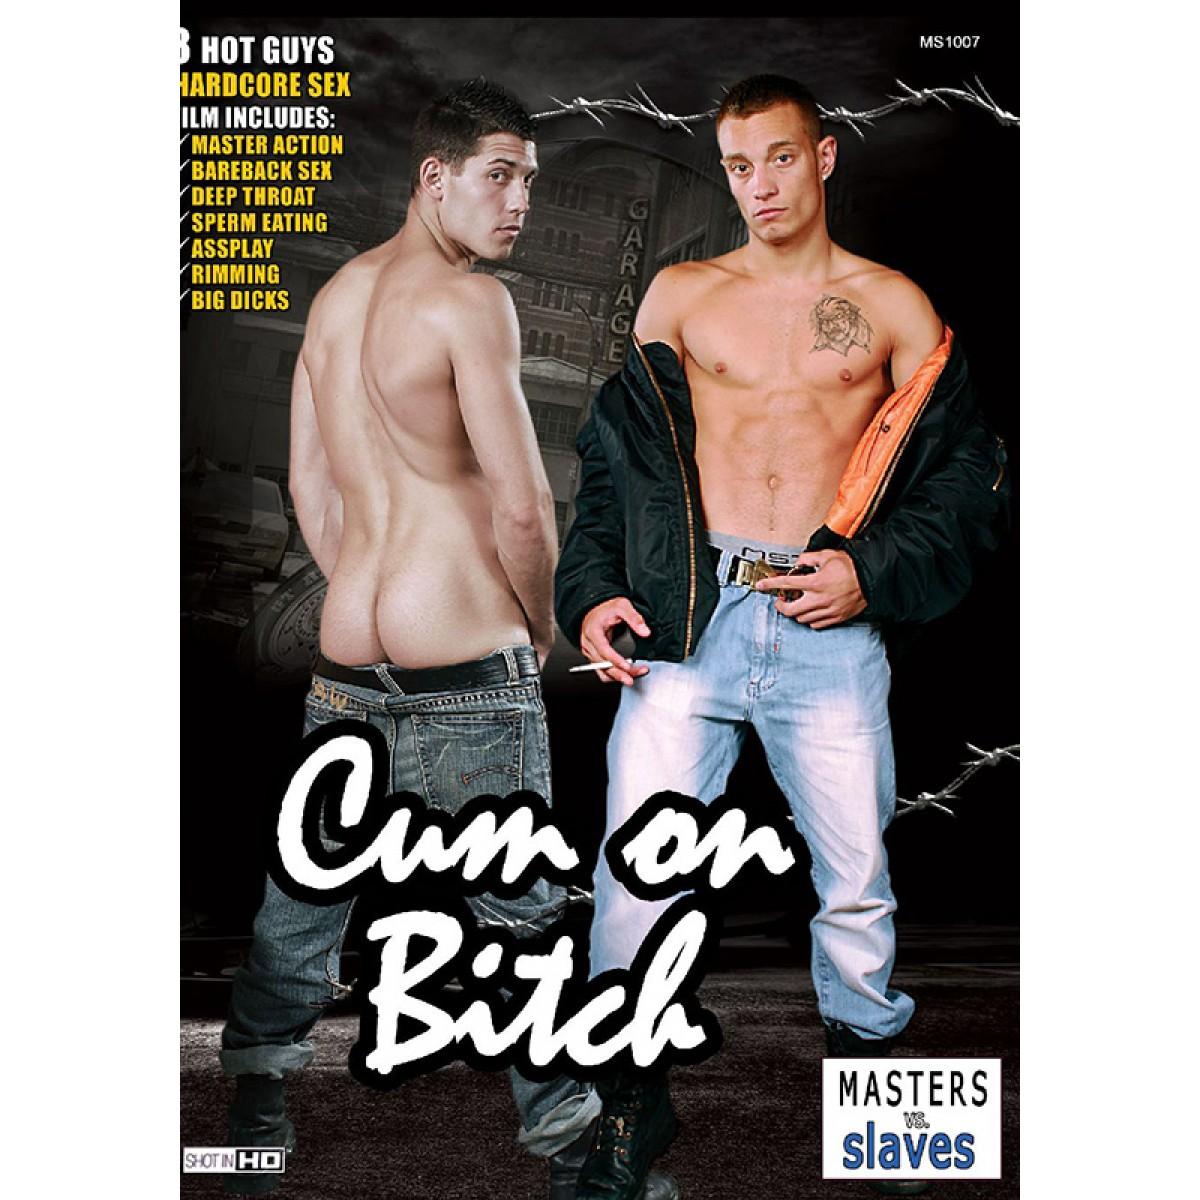 cum on bitch dvd (s) - bareback - sex actions - dvds